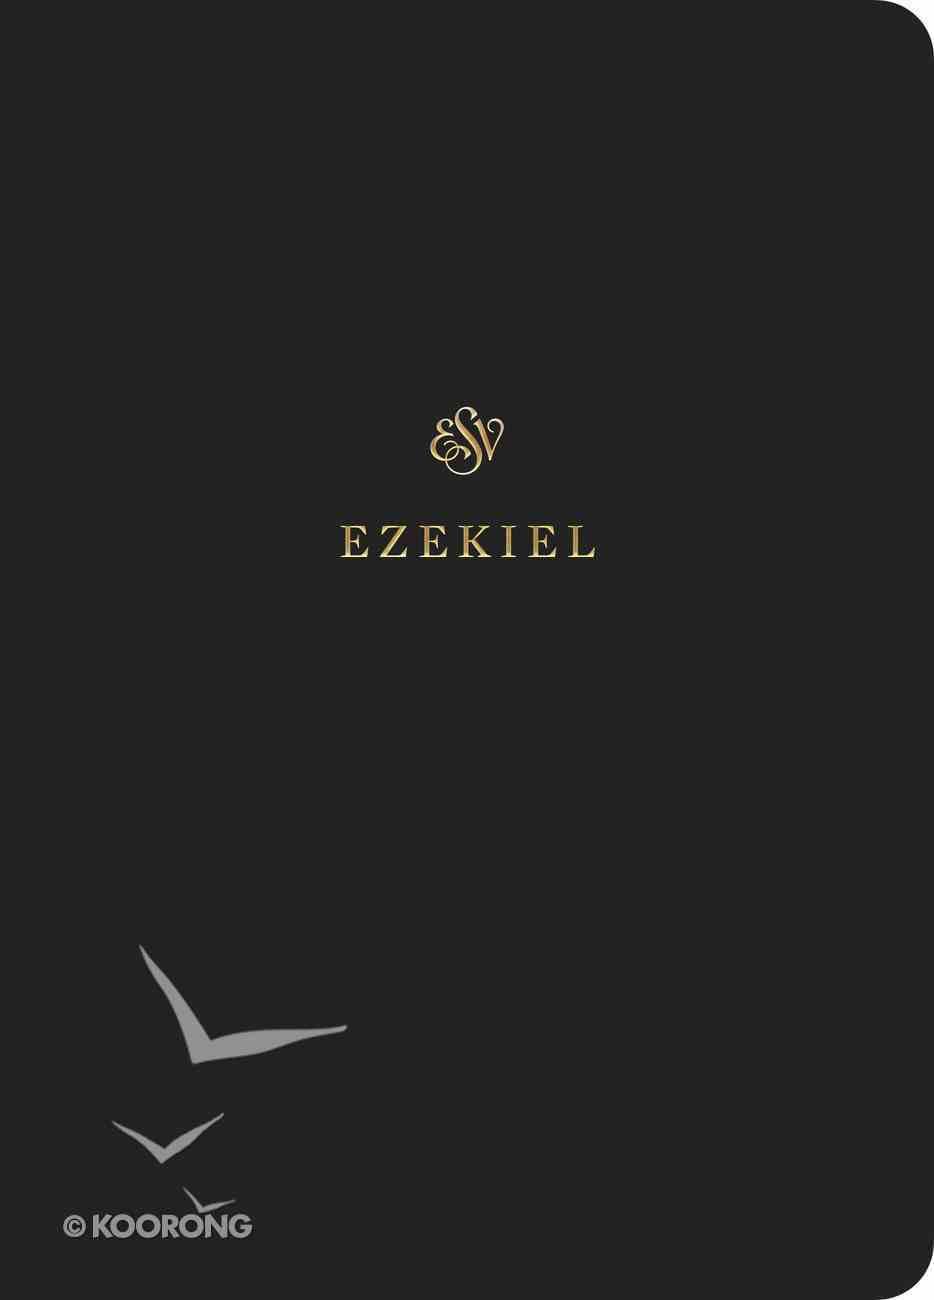 ESV Scripture Journal Ezekiel Paperback